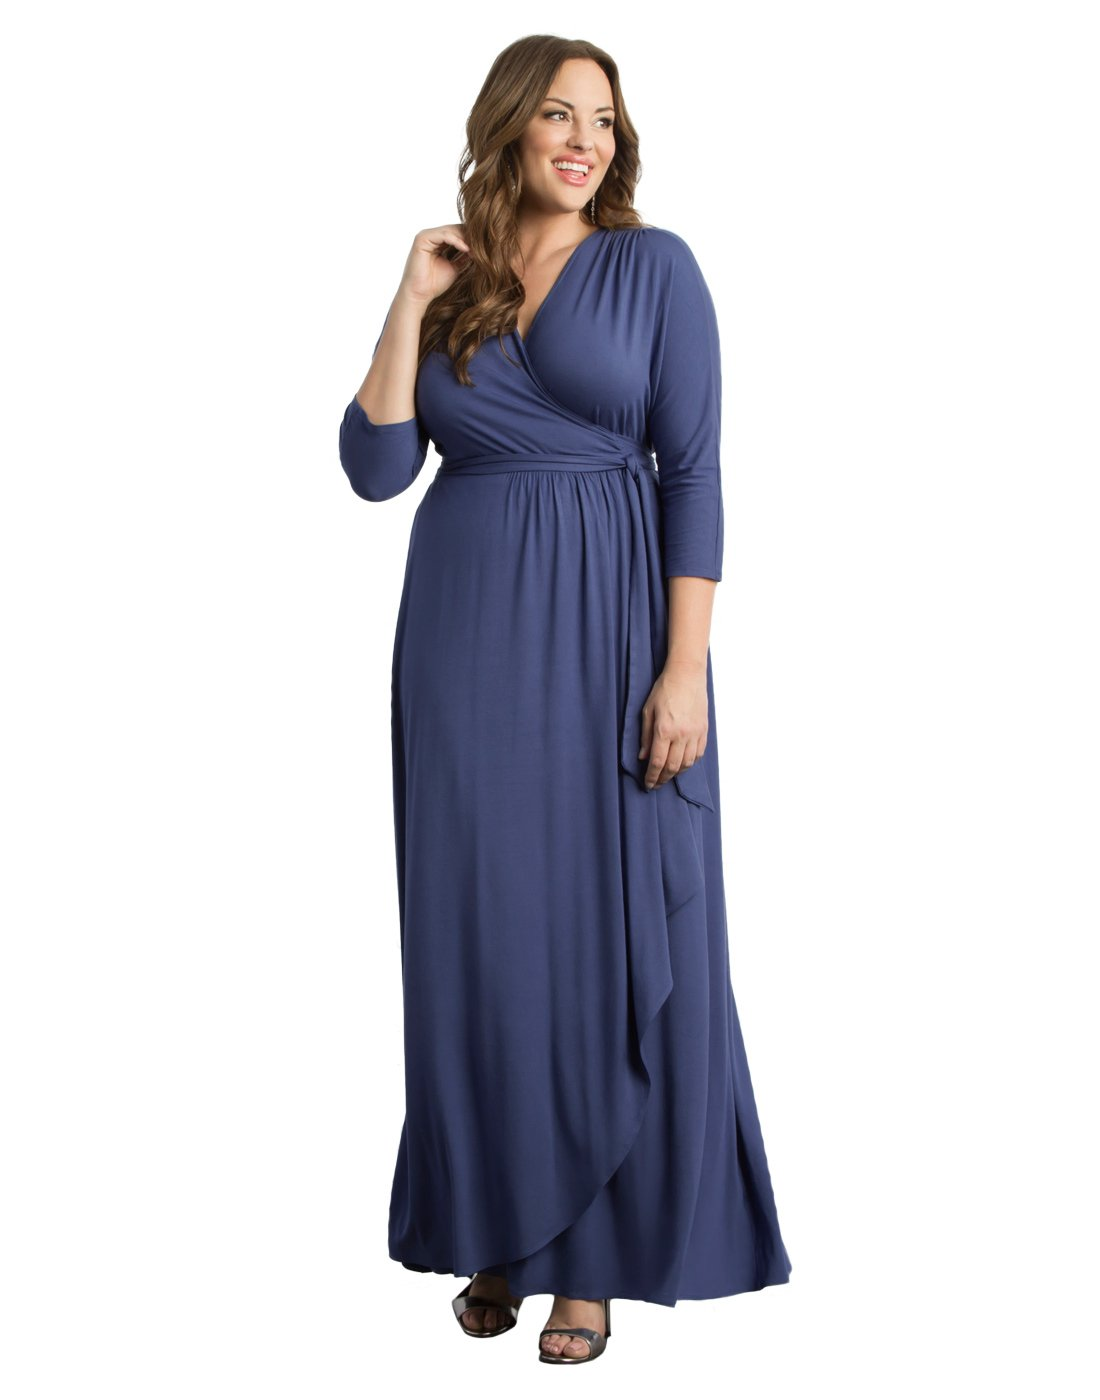 Kiyonna Women's Plus Size Wrapped in Romance Dress 1X Bluebird